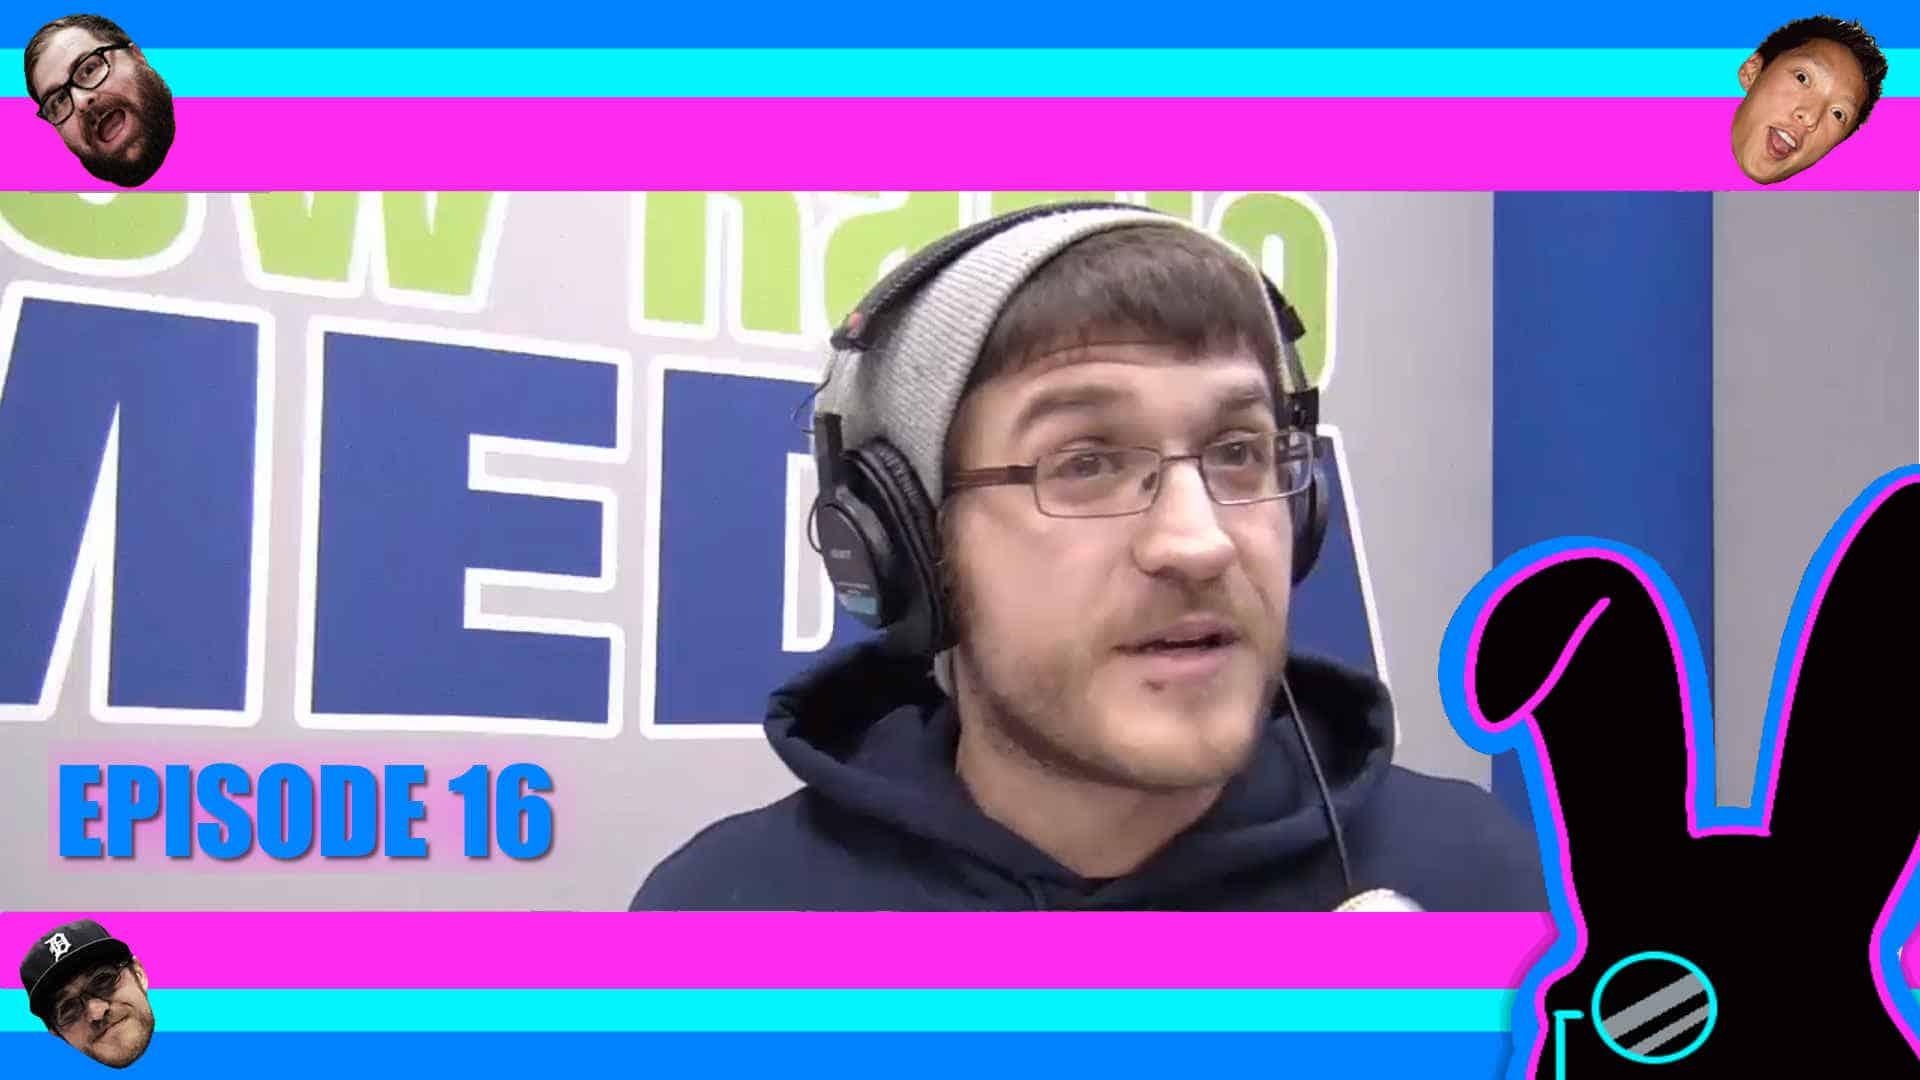 Geektainment Weekly - Episode 16